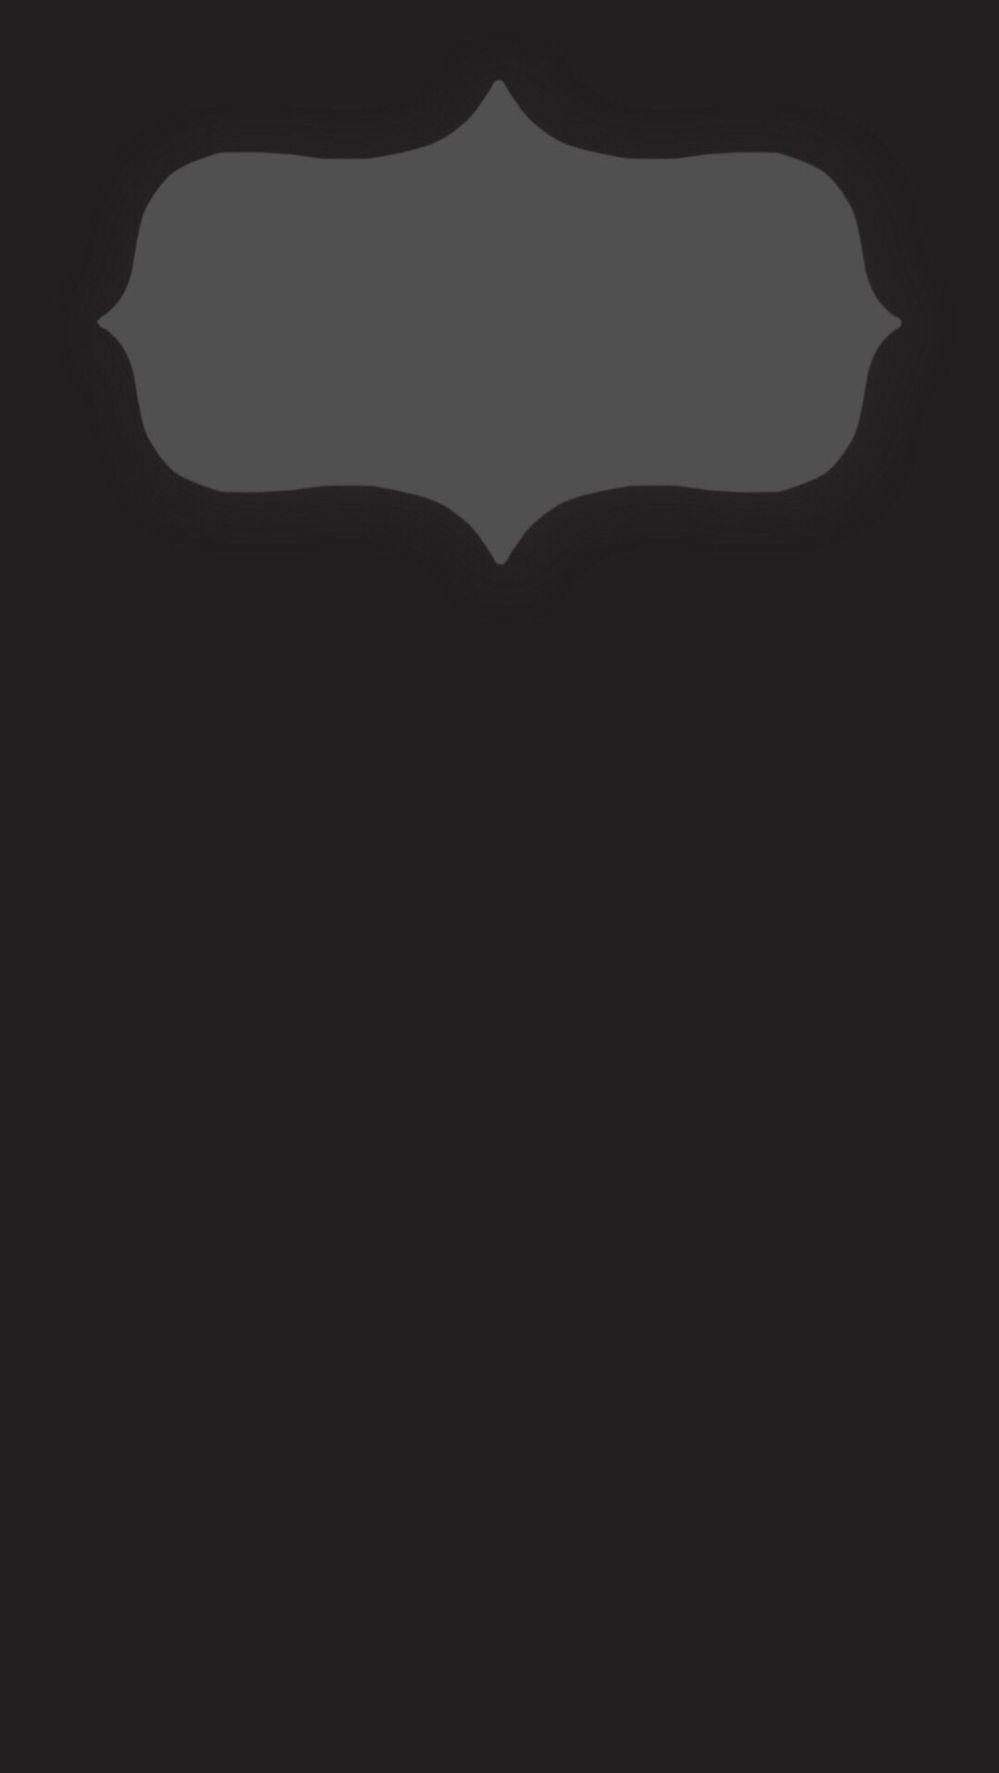 Iphone 6 Lock Screen Wallpapers On Wallpaperdog